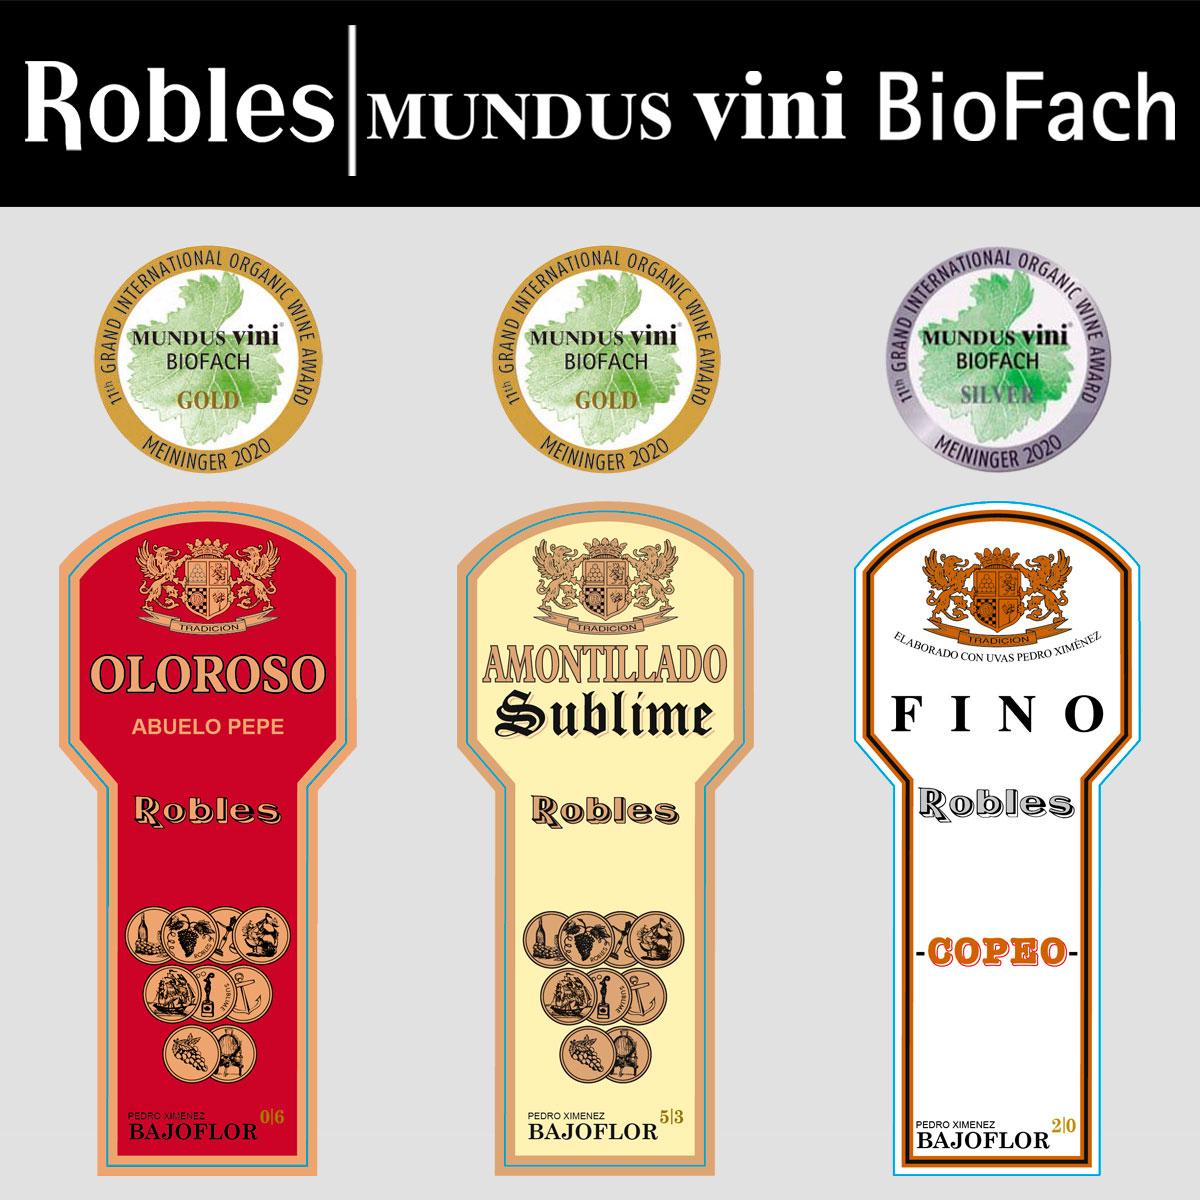 Award winning Mundus Vini Biofach 2020